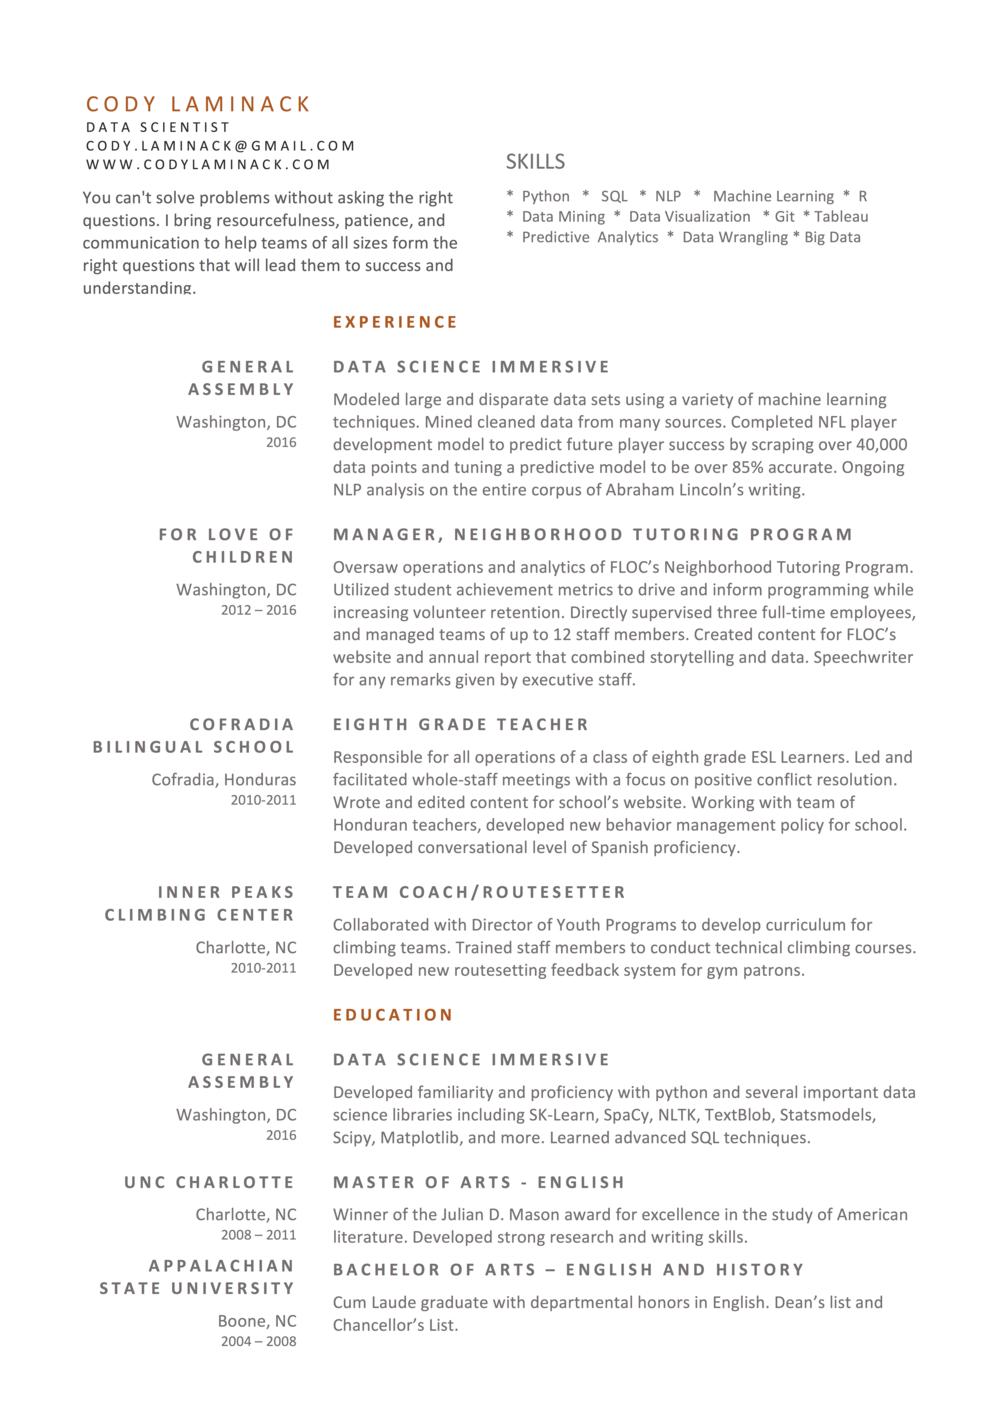 resume - Data Science Student Resume